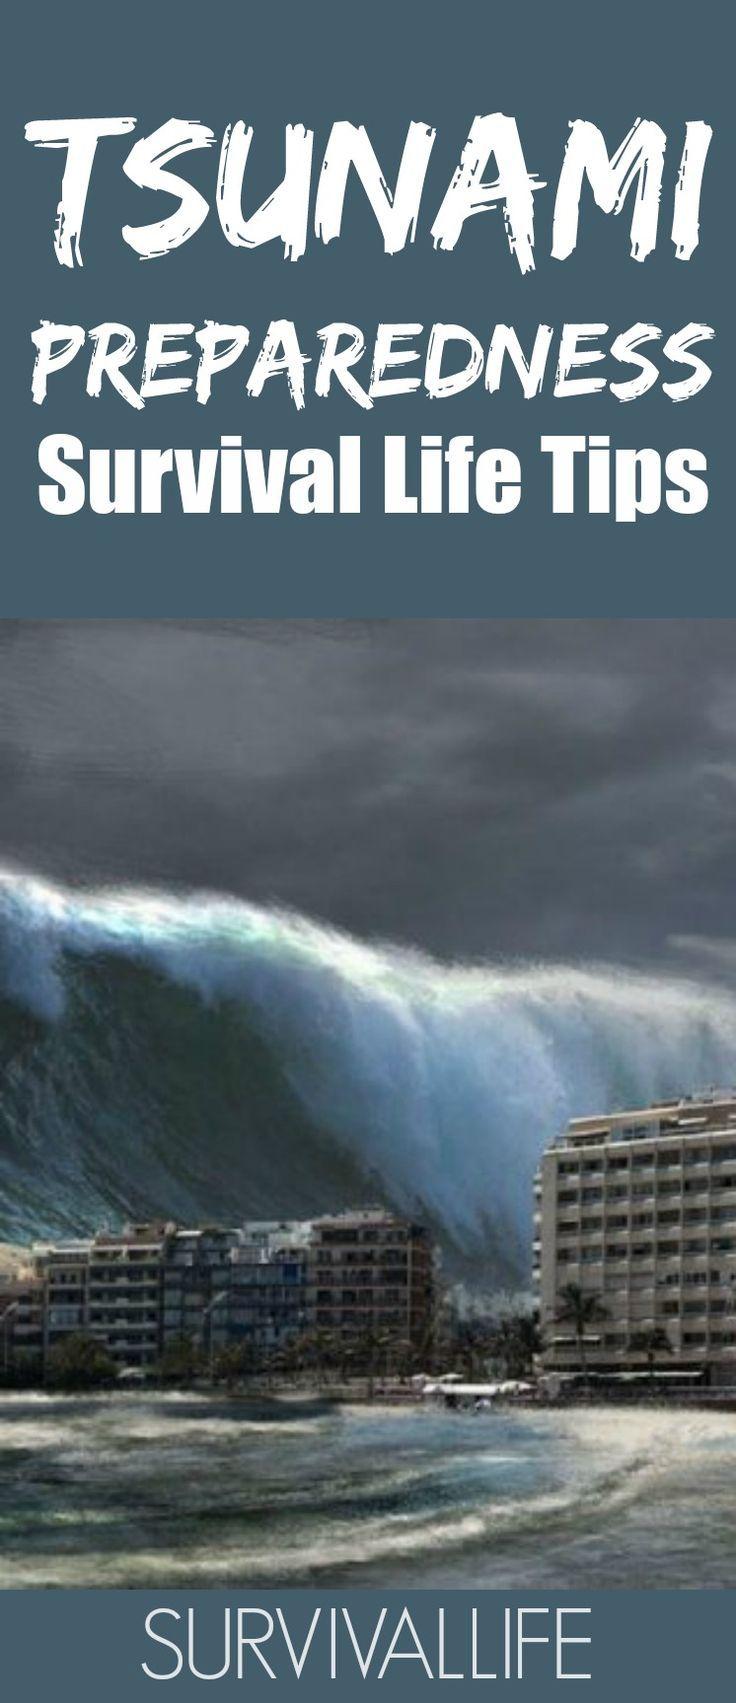 Tsunami Preparedness Survival Life Survival Prepping Wilderness Survival